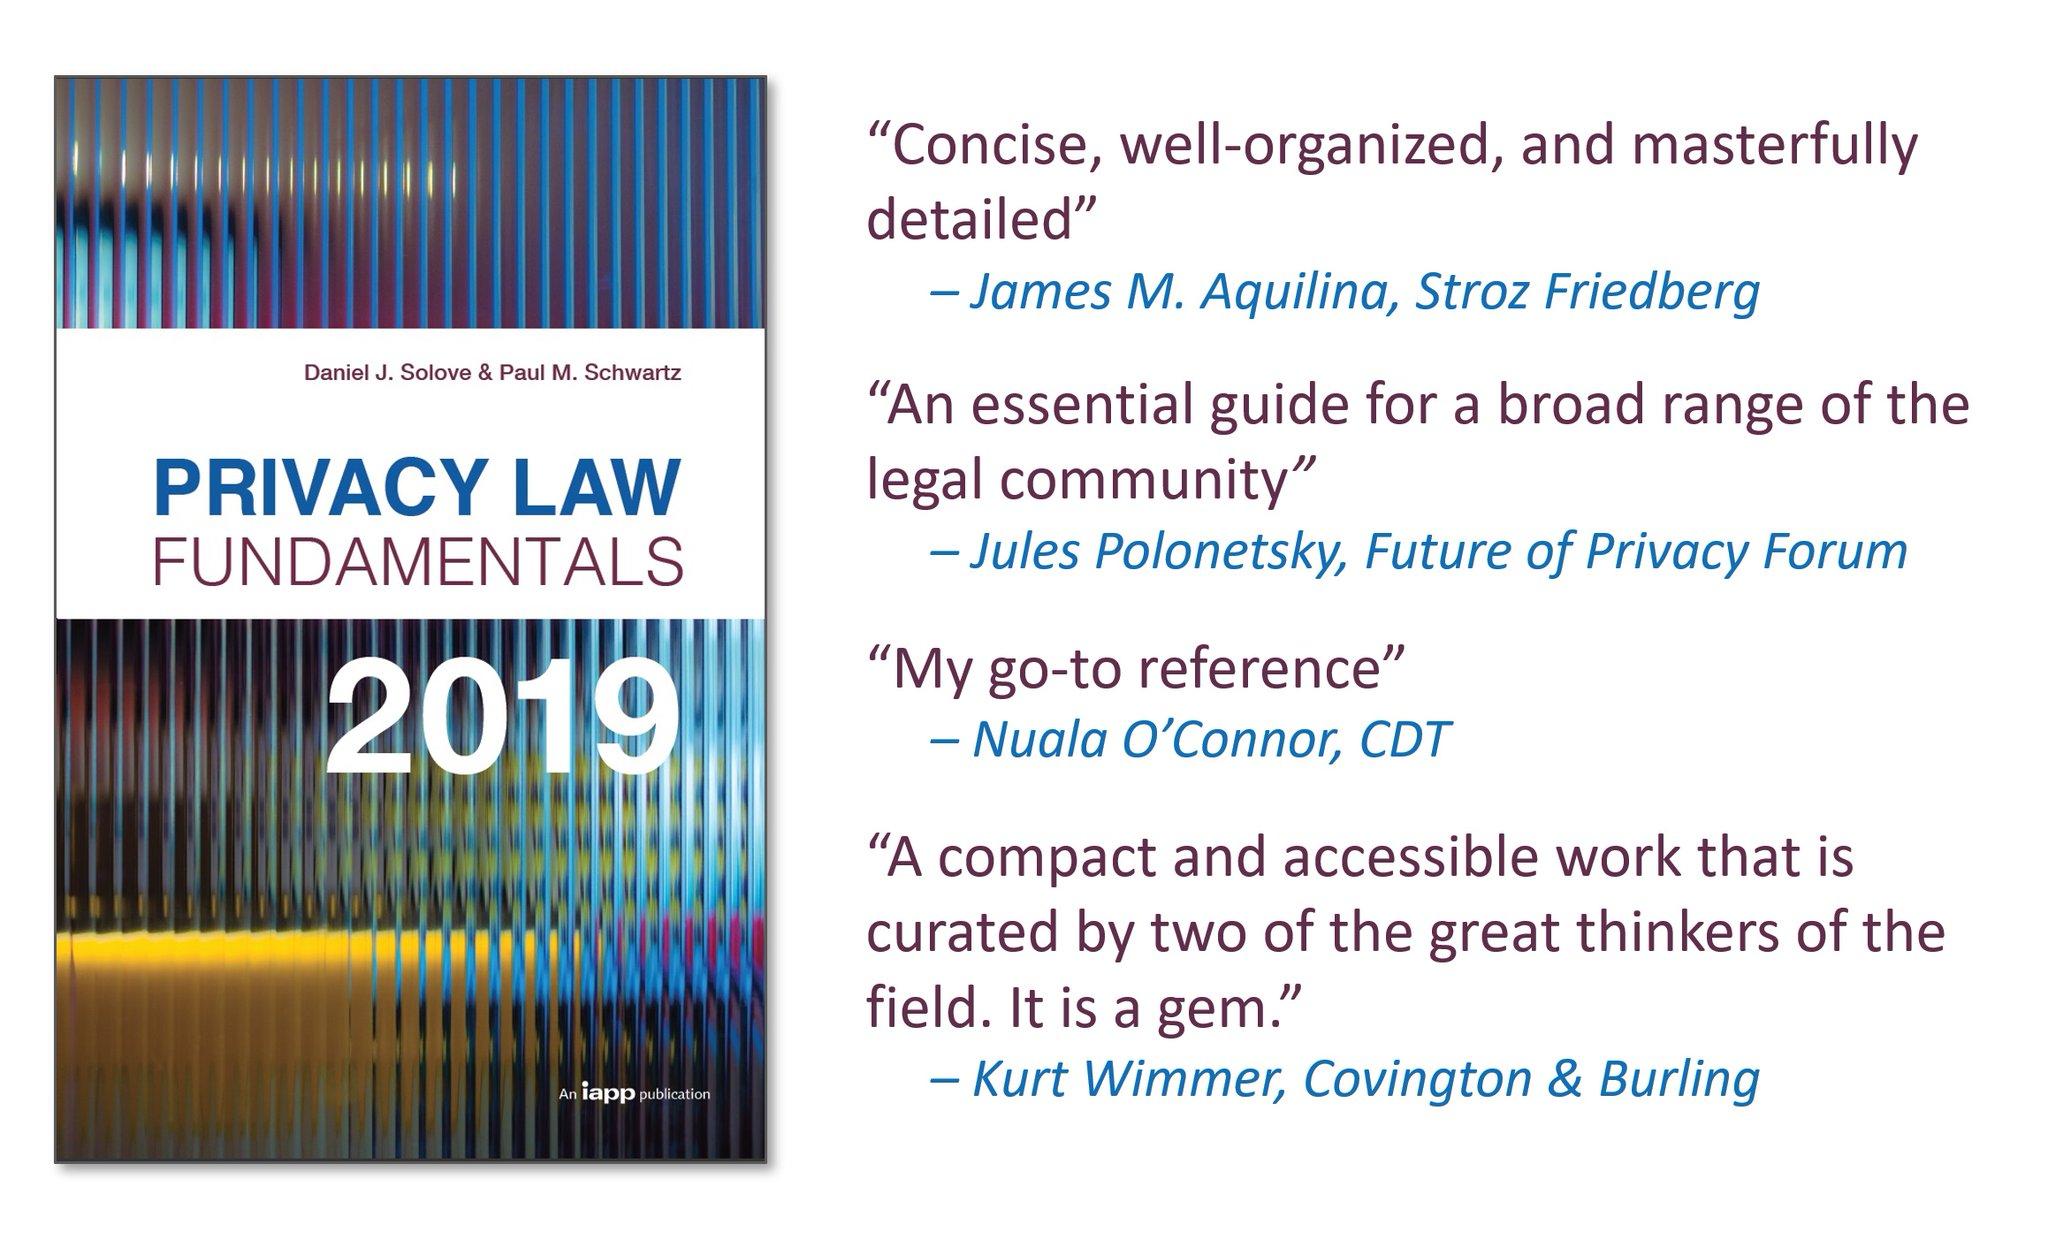 Resource: Privacy Law Fundamentals, Fifth Edition - Solove & Schwartz